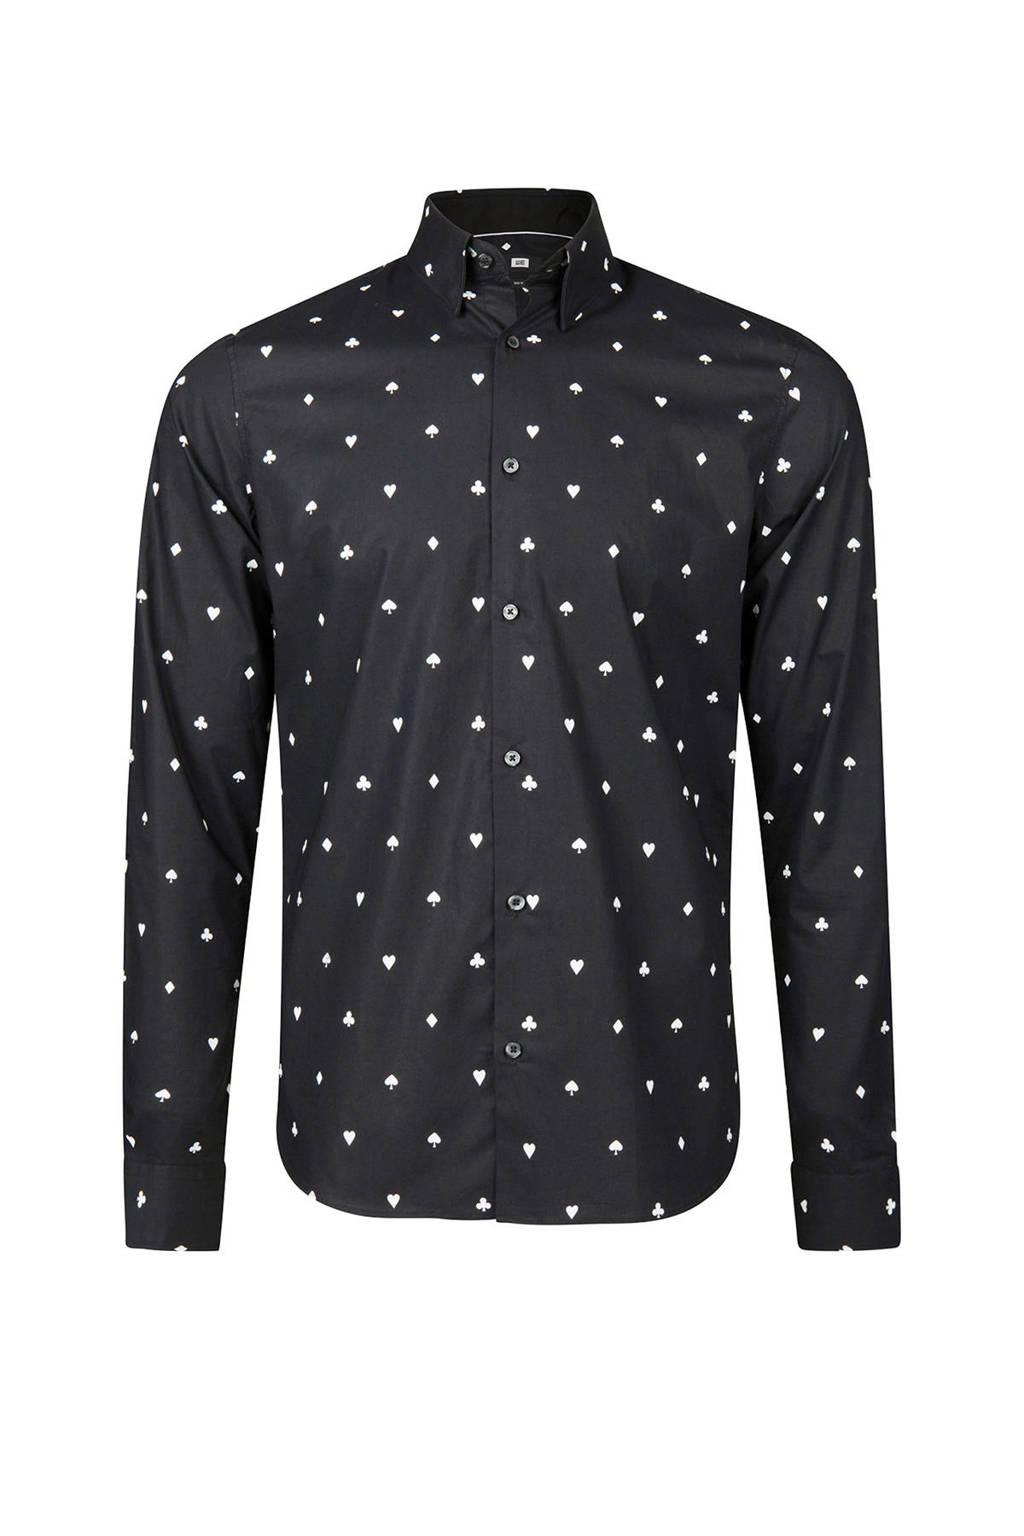 Zwart Overhemd We.We Fashion Slim Fit Overhemd Met Print Zwart Wehkamp